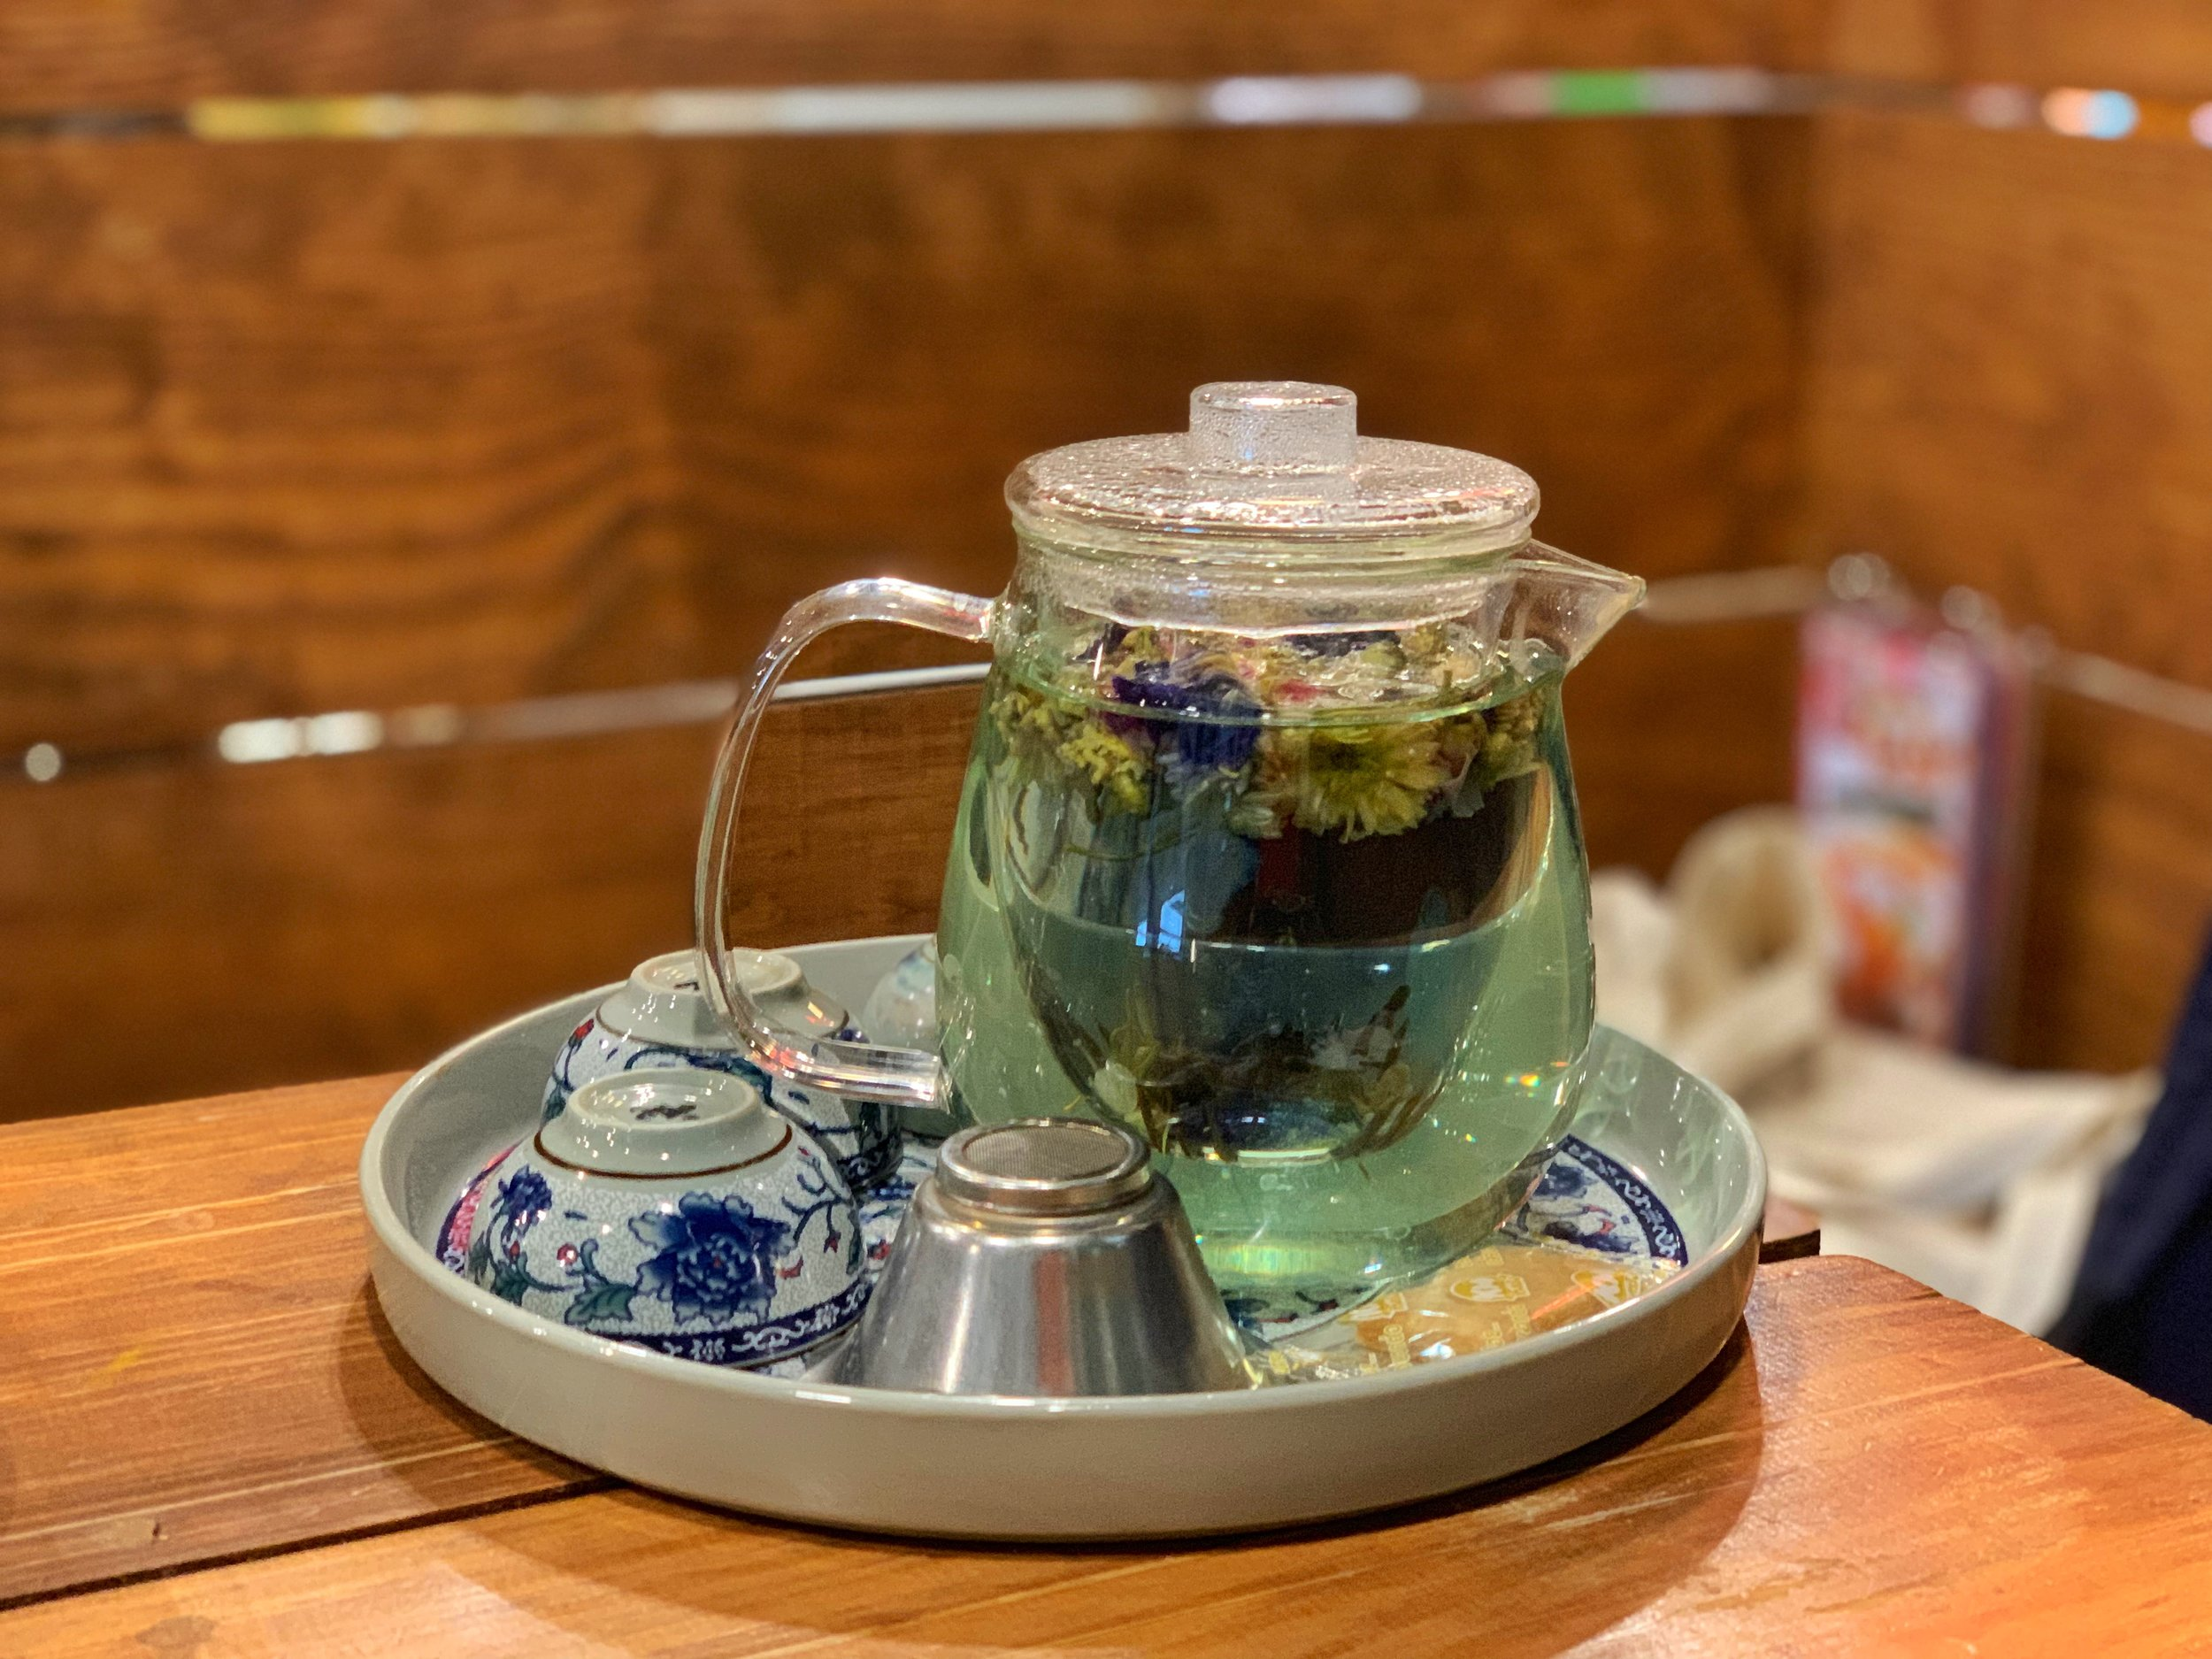 lhongtou tea cafe bangkok thailand the market